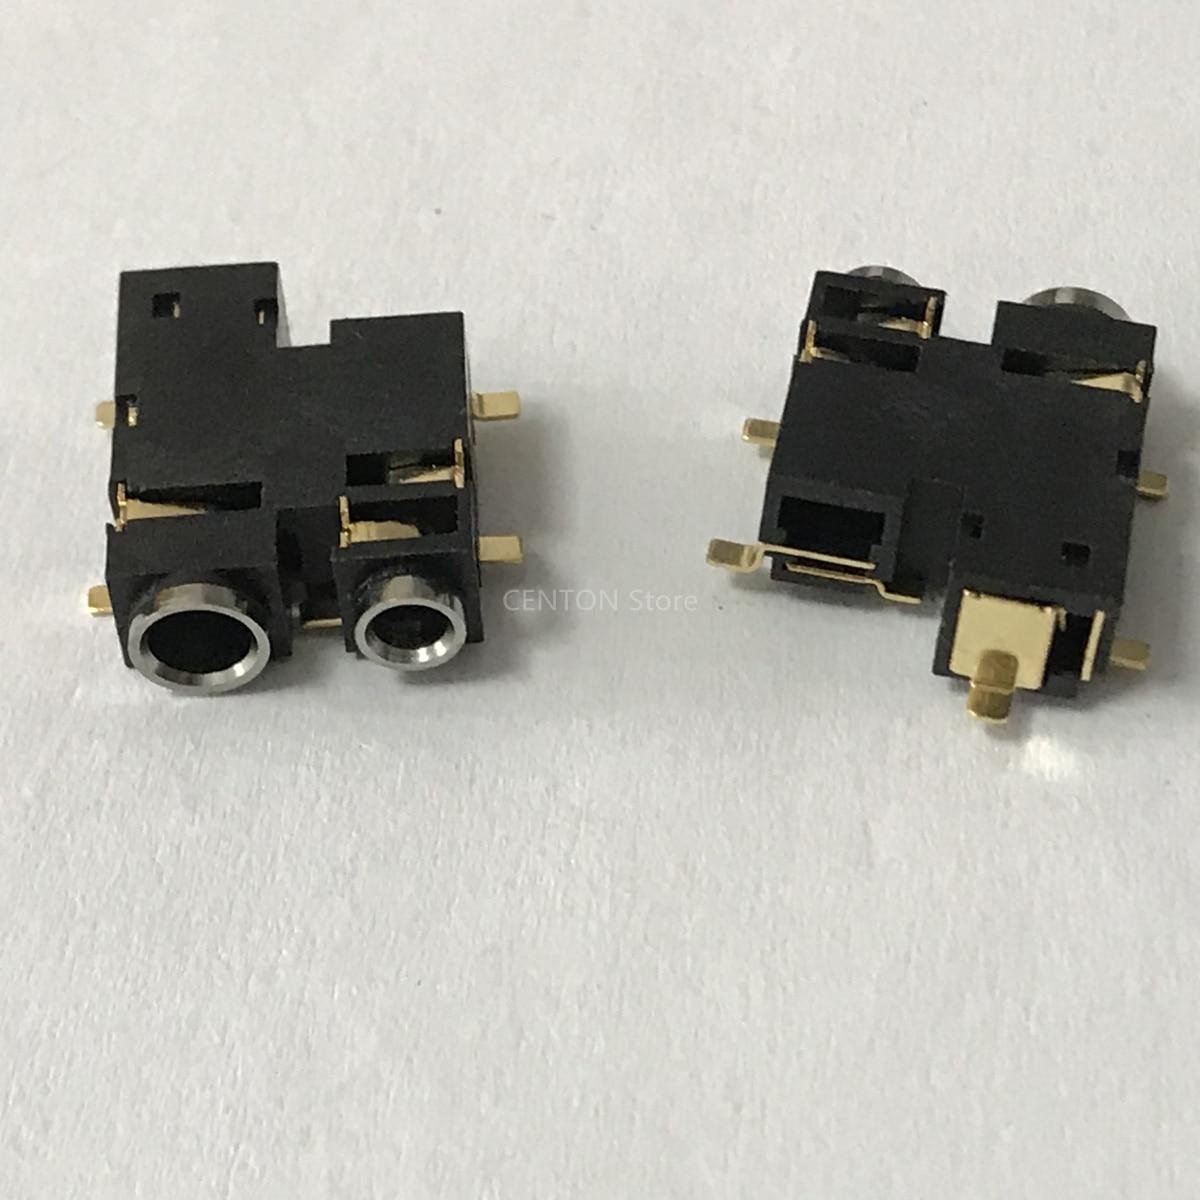 5x tomada do fone de ouvido jack para motorola ep450 a8 cp040 gp3188 gp3688 conector alto-falante